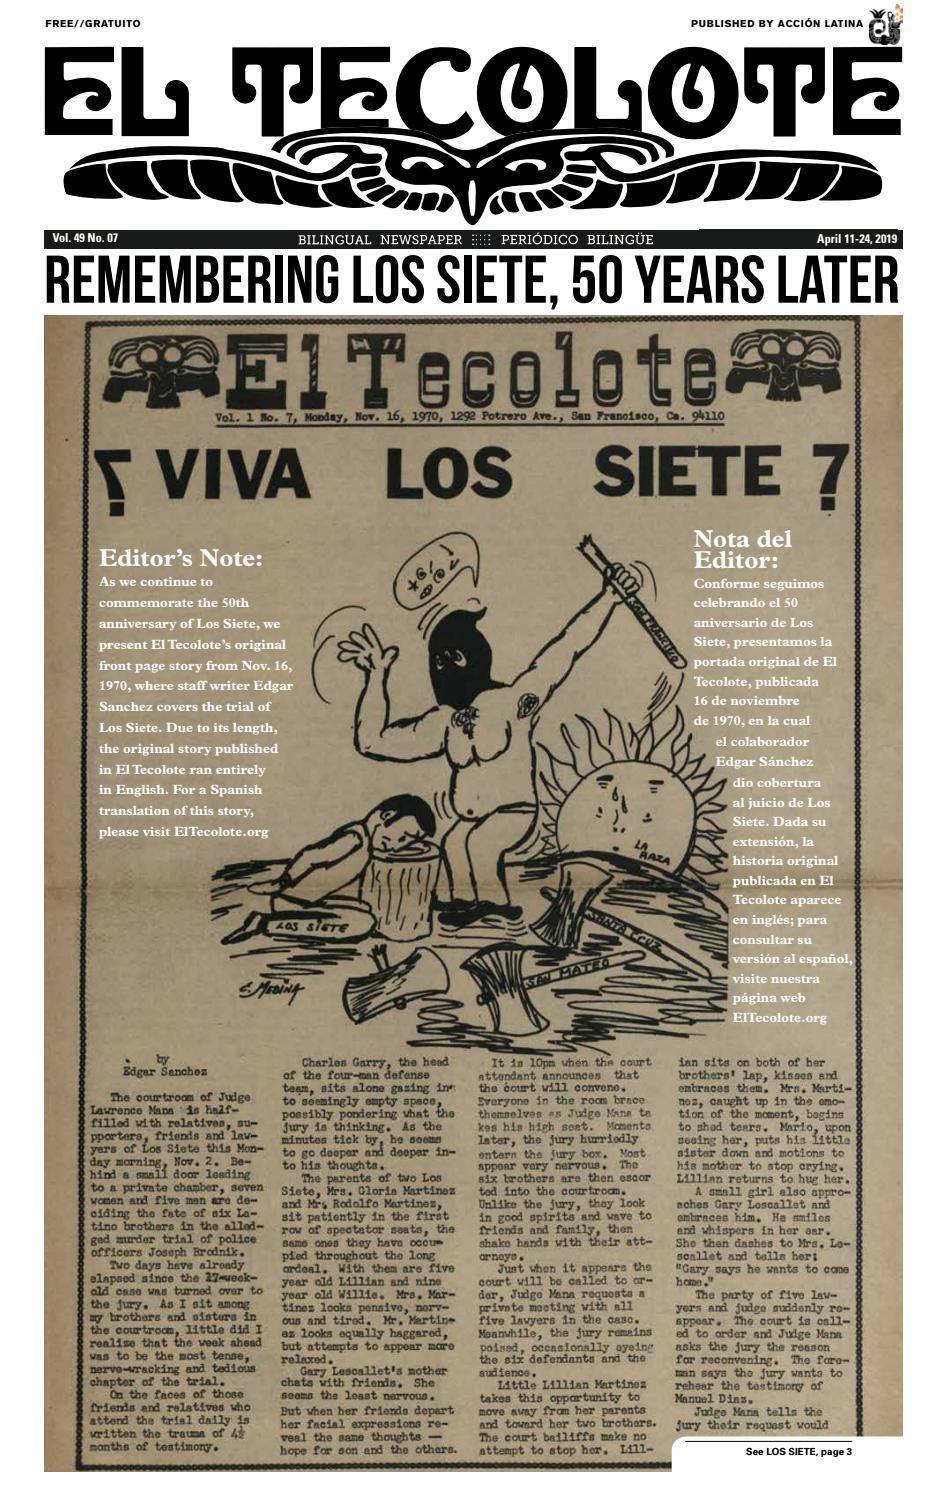 El Tecolote Vol 49 Issue 07 By El Tecolote Issuu